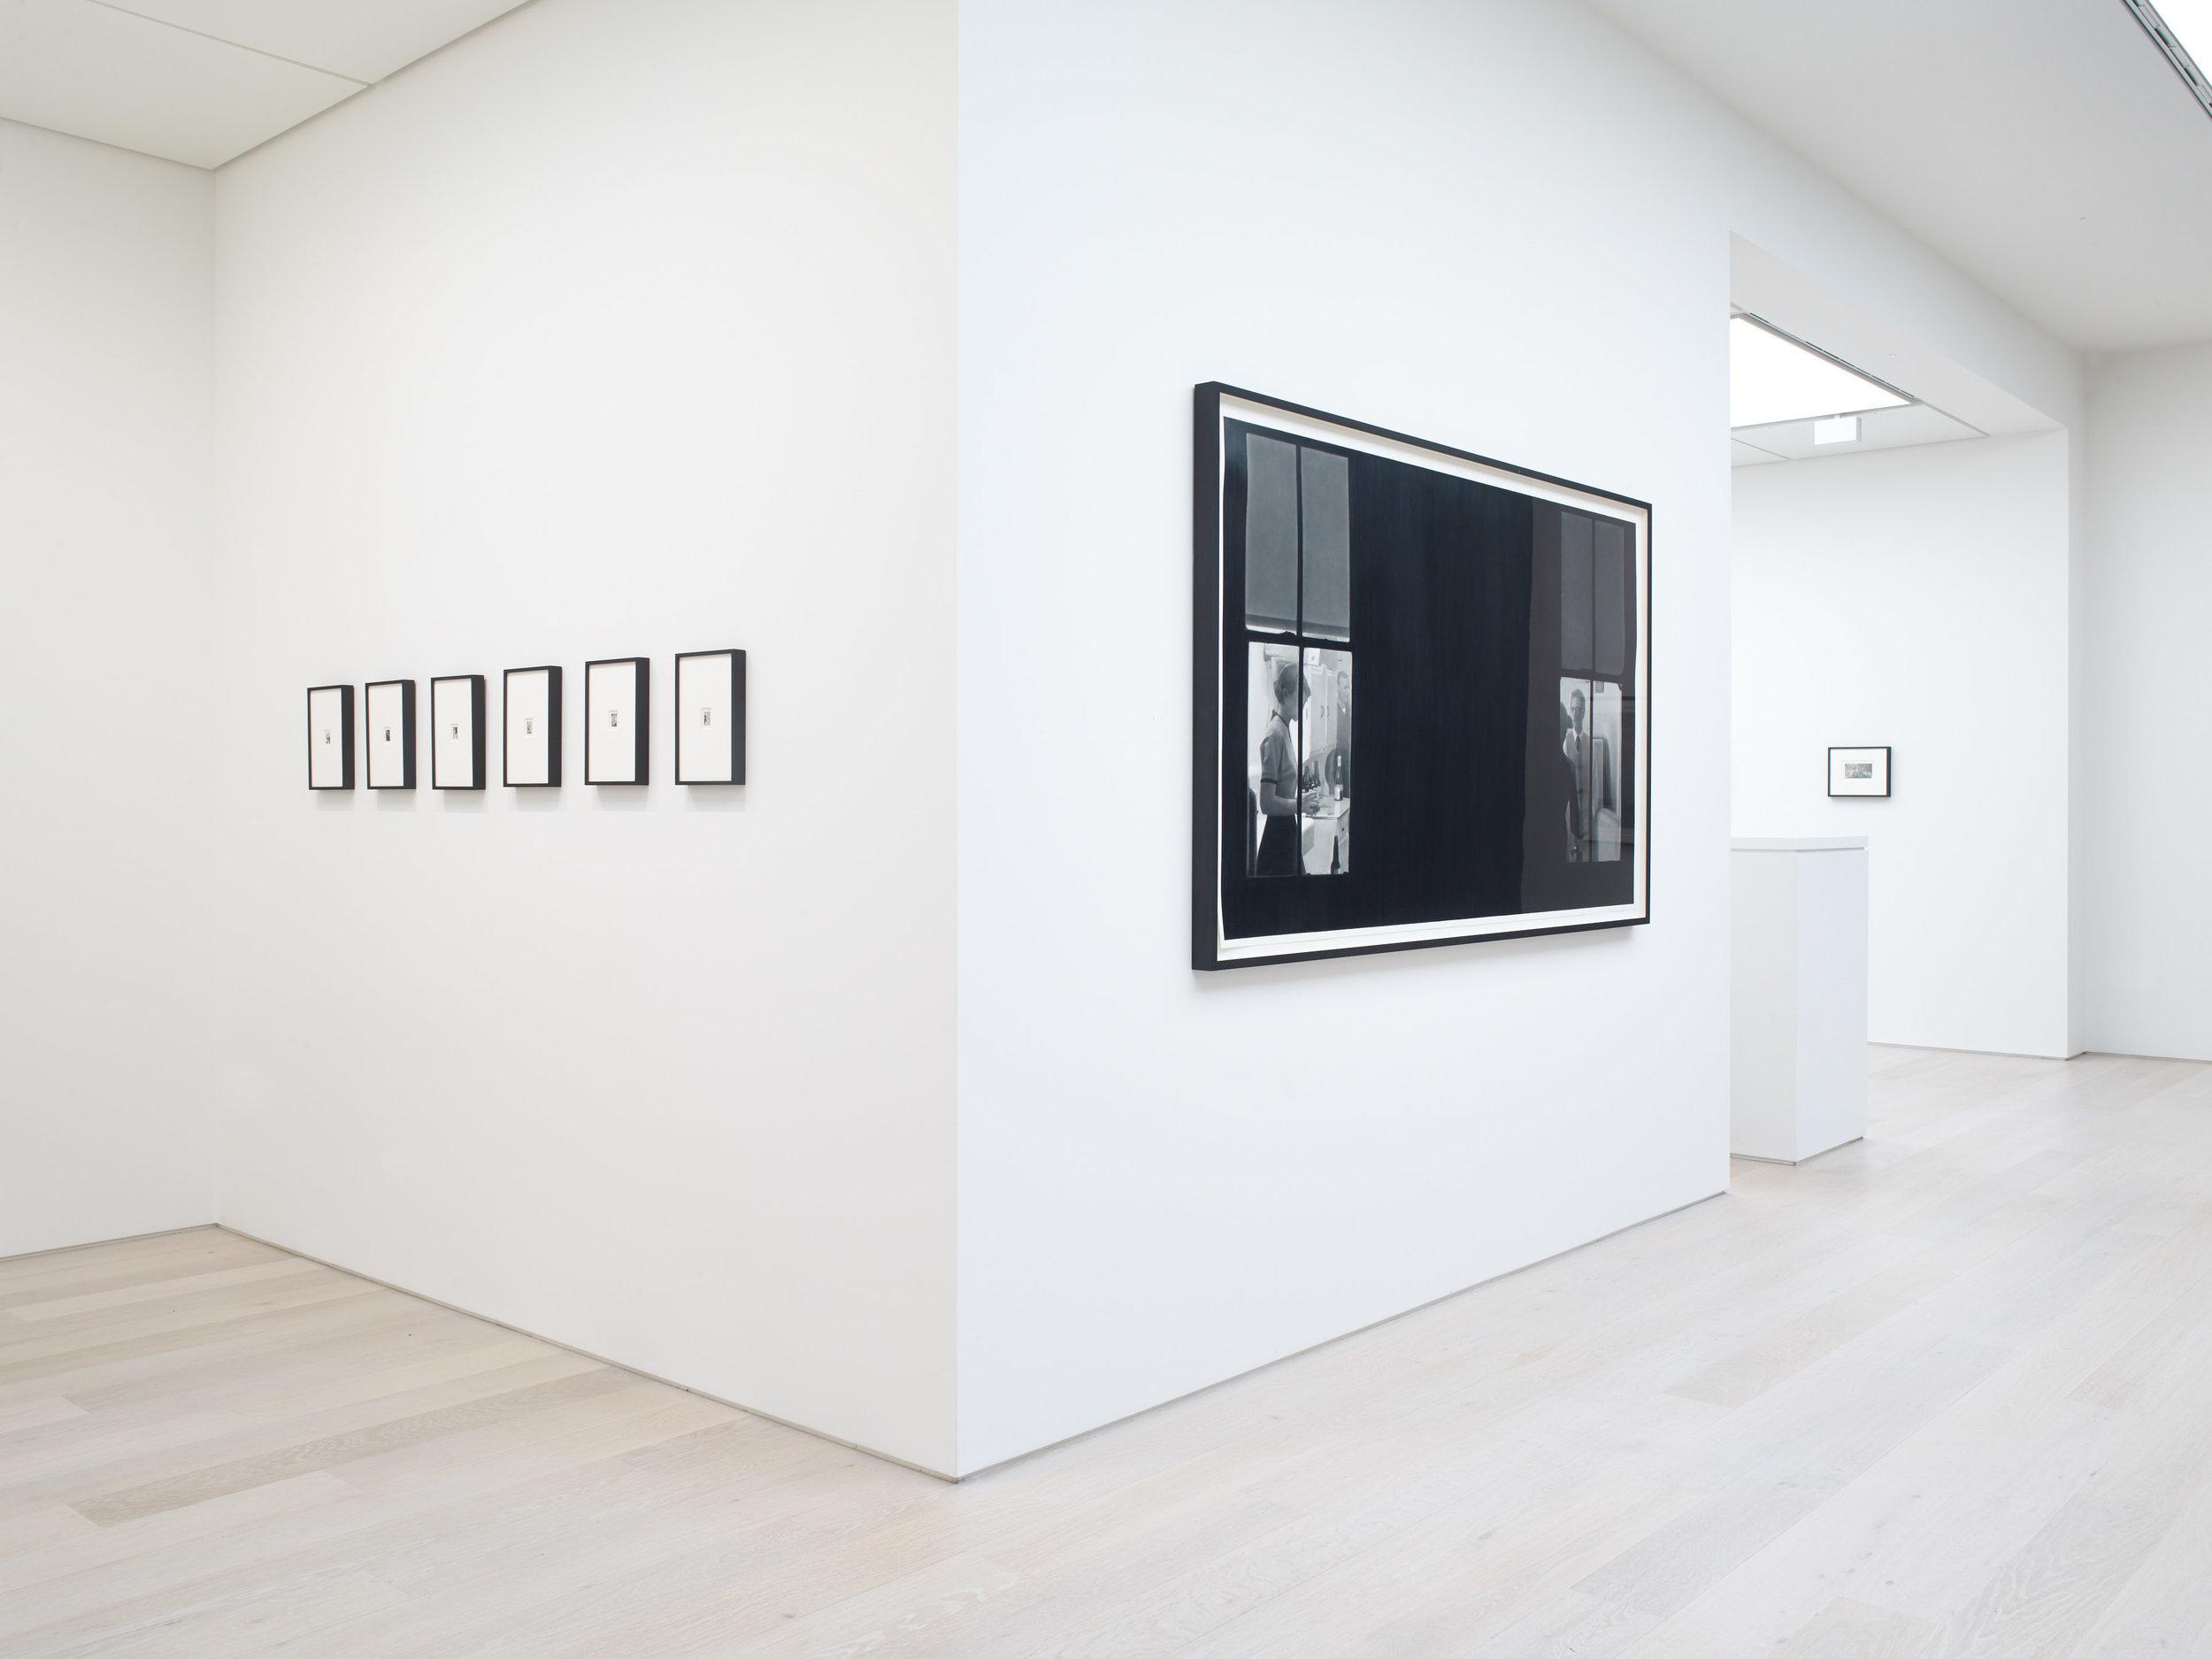 Marie Harnett_Still_Alan Cristea Gallery 2017 installation. Photo Stephe...-11.jpg